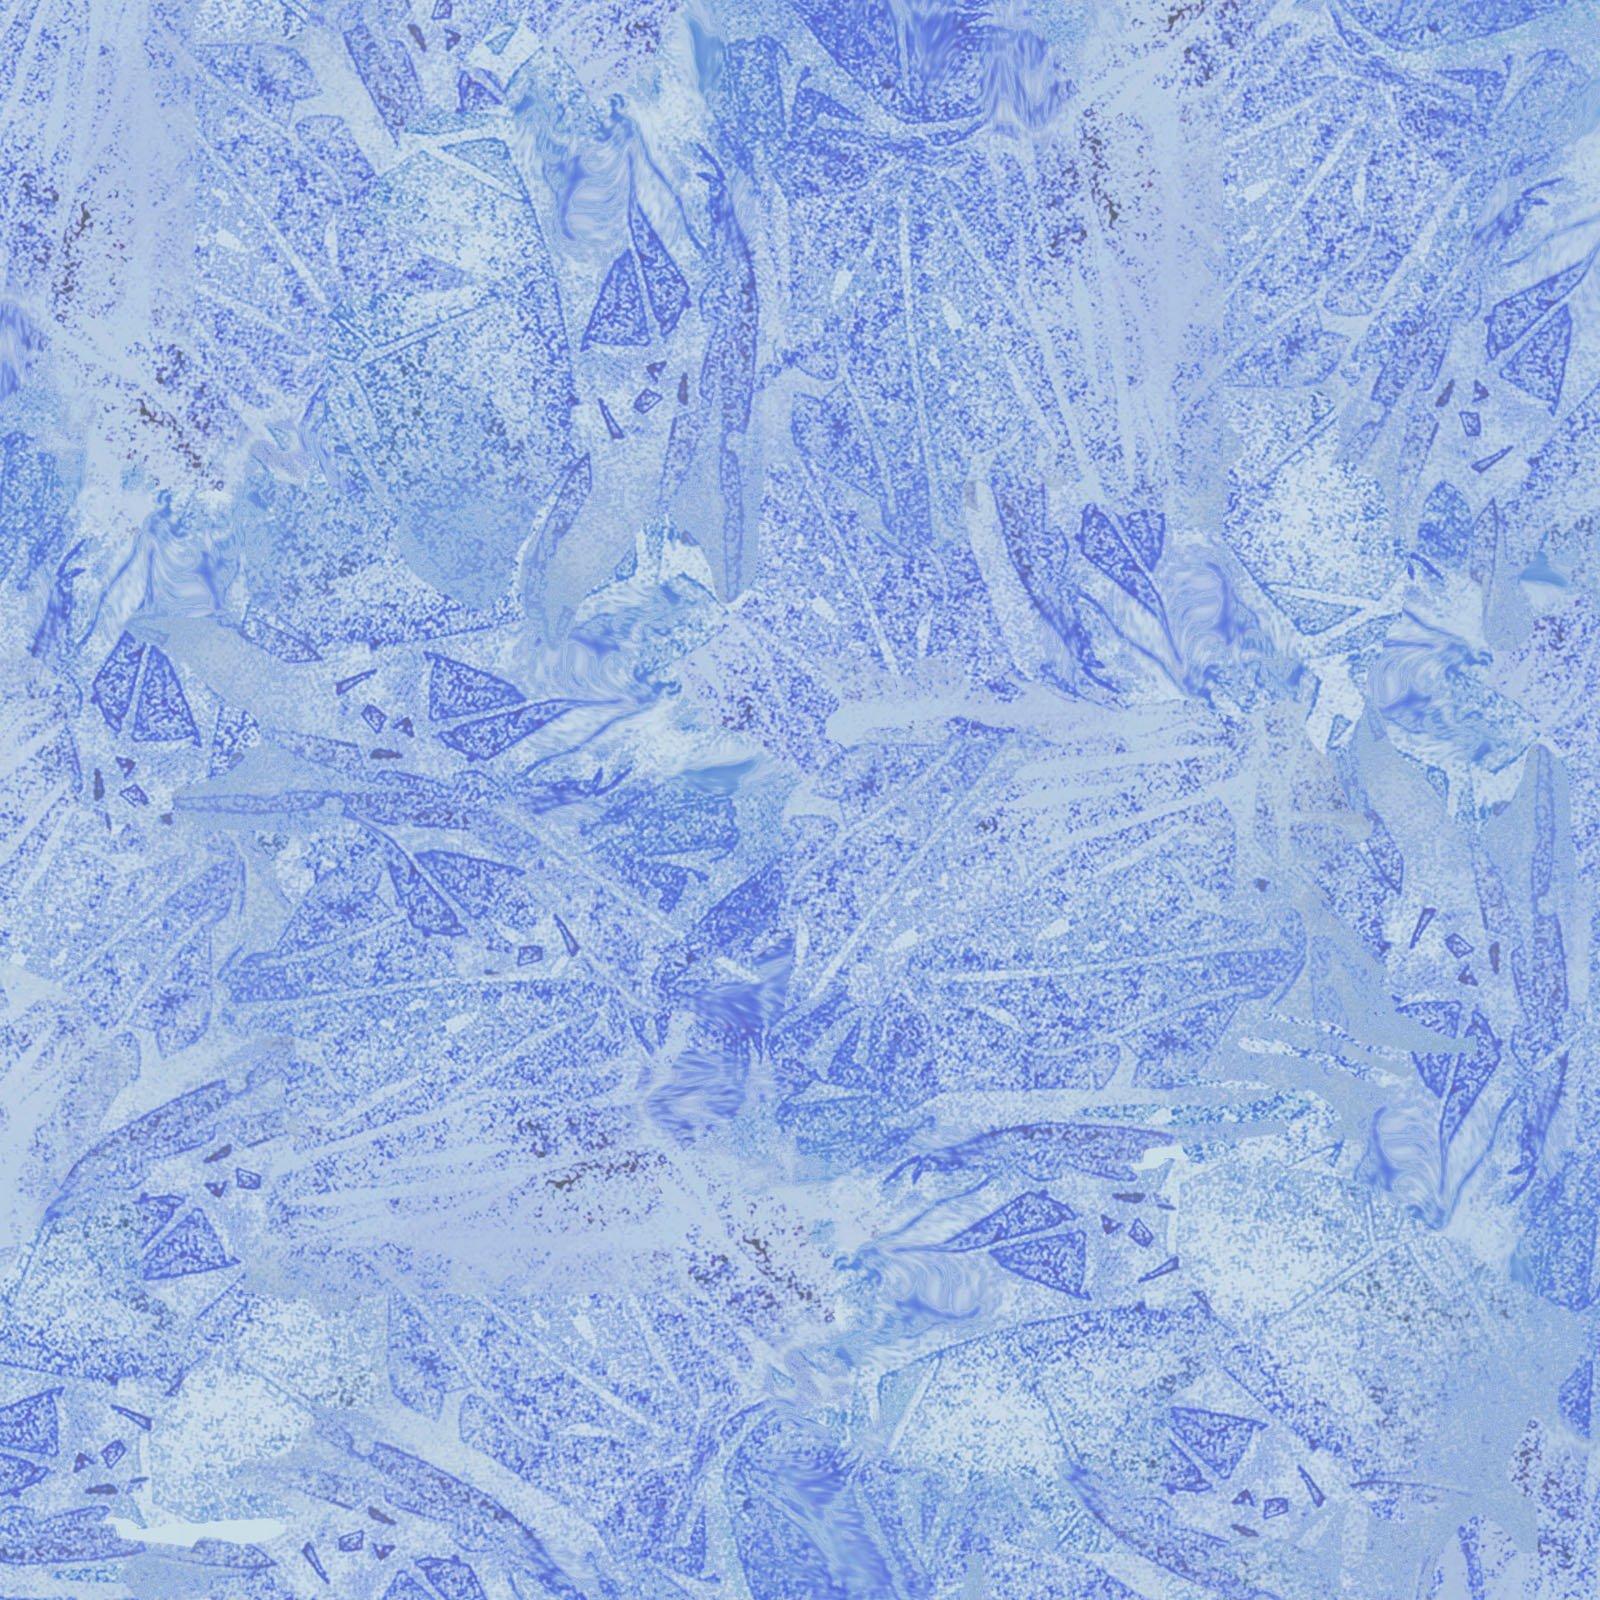 FRAC-4123 B - FRACTURE BY TERESA ASCONE BLUE